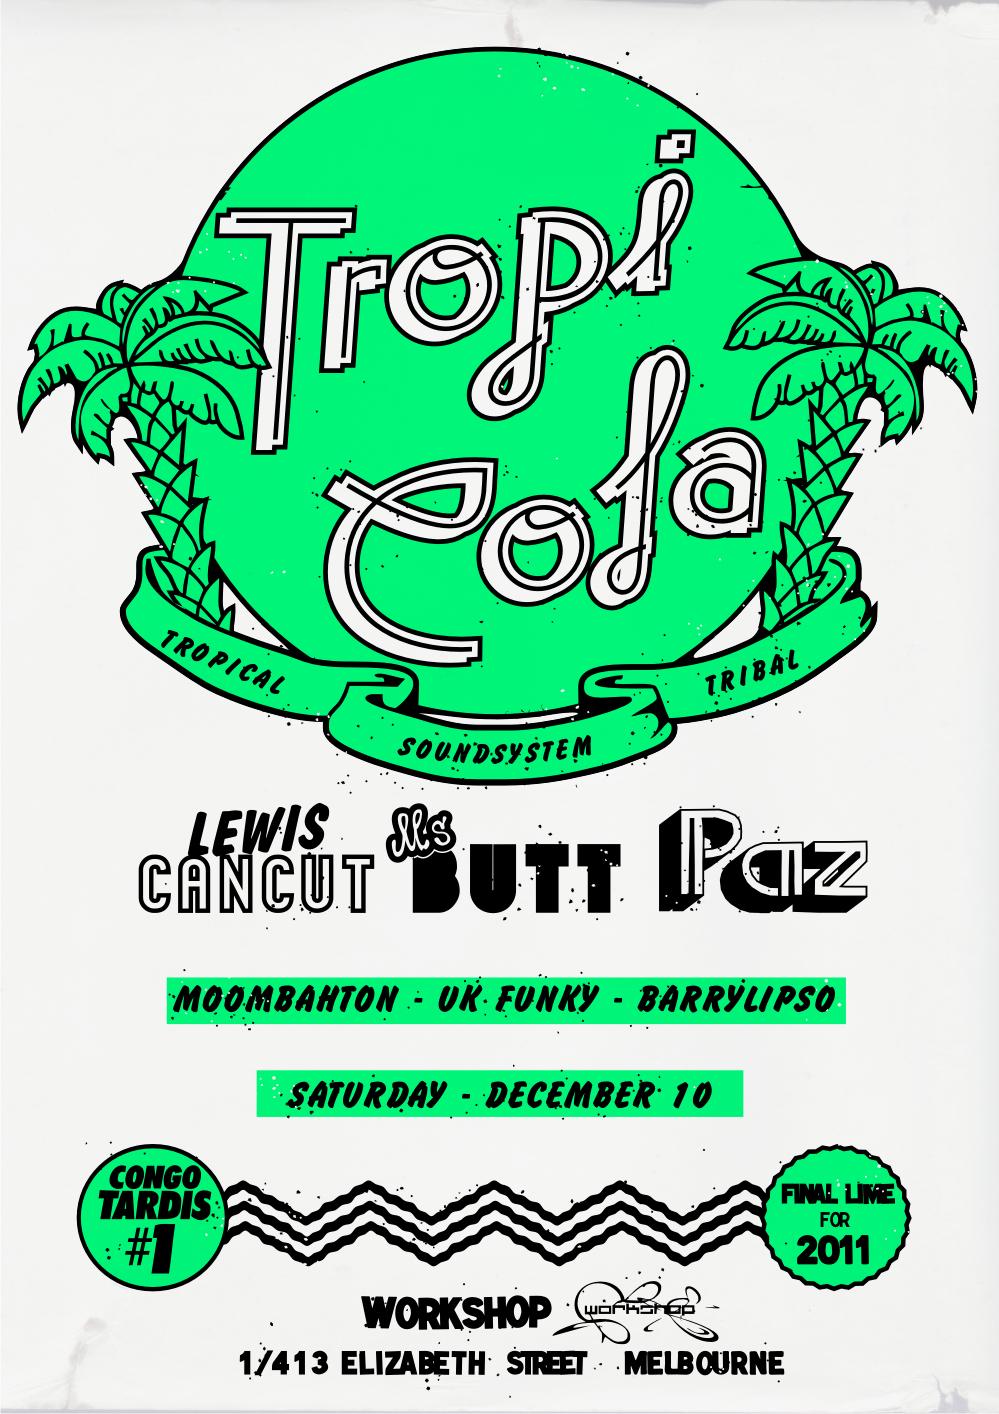 Tropicola - Workshop - Dec 10th - 2011